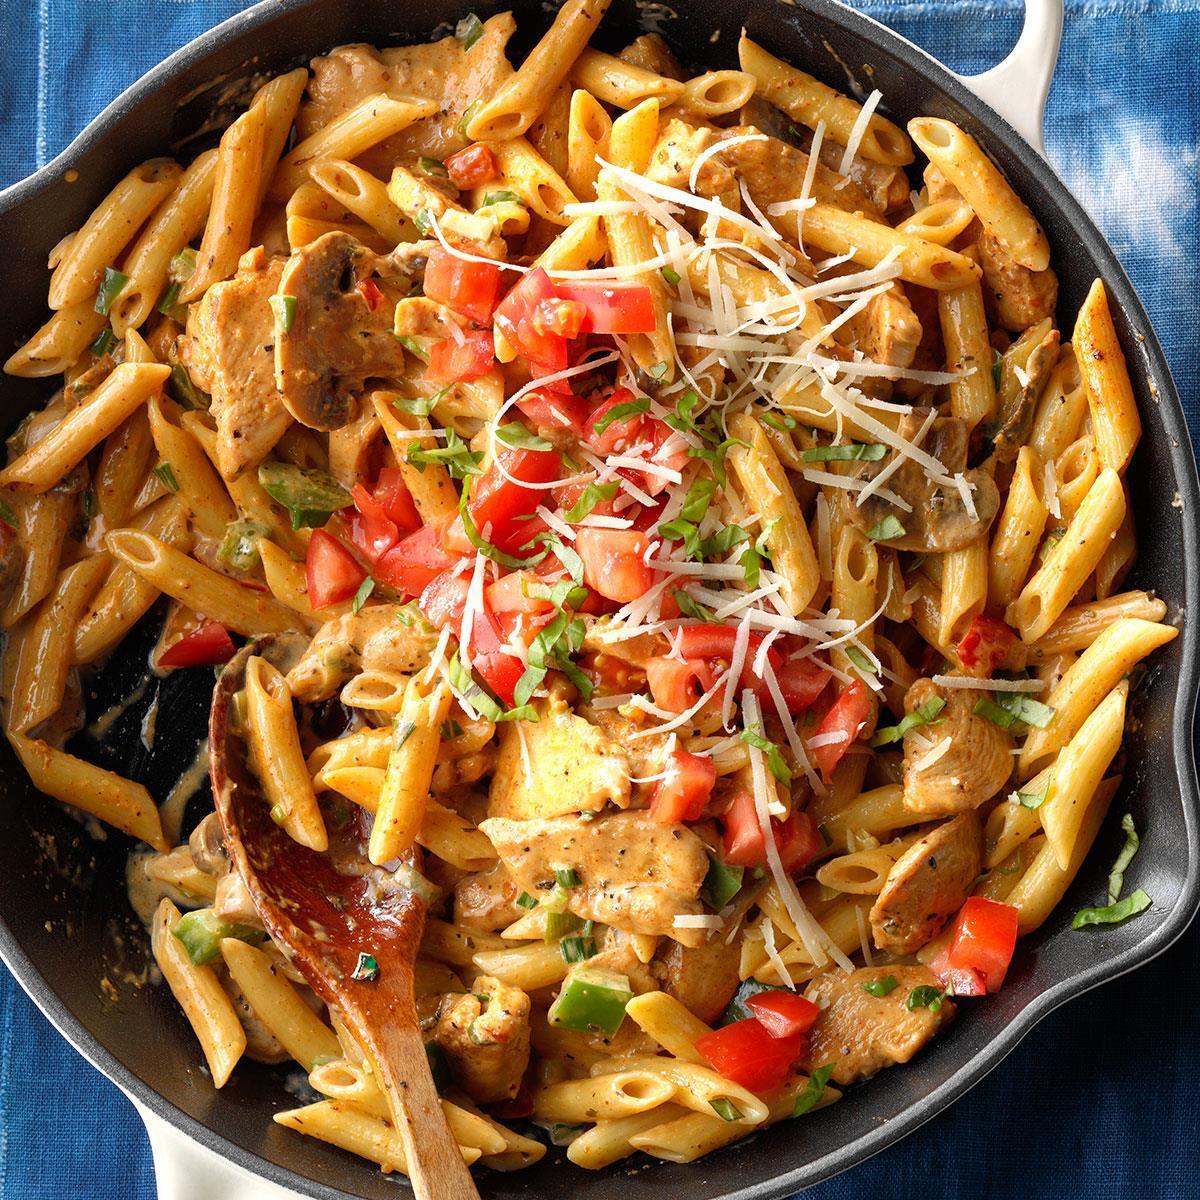 Cajun Chicken & Pasta image